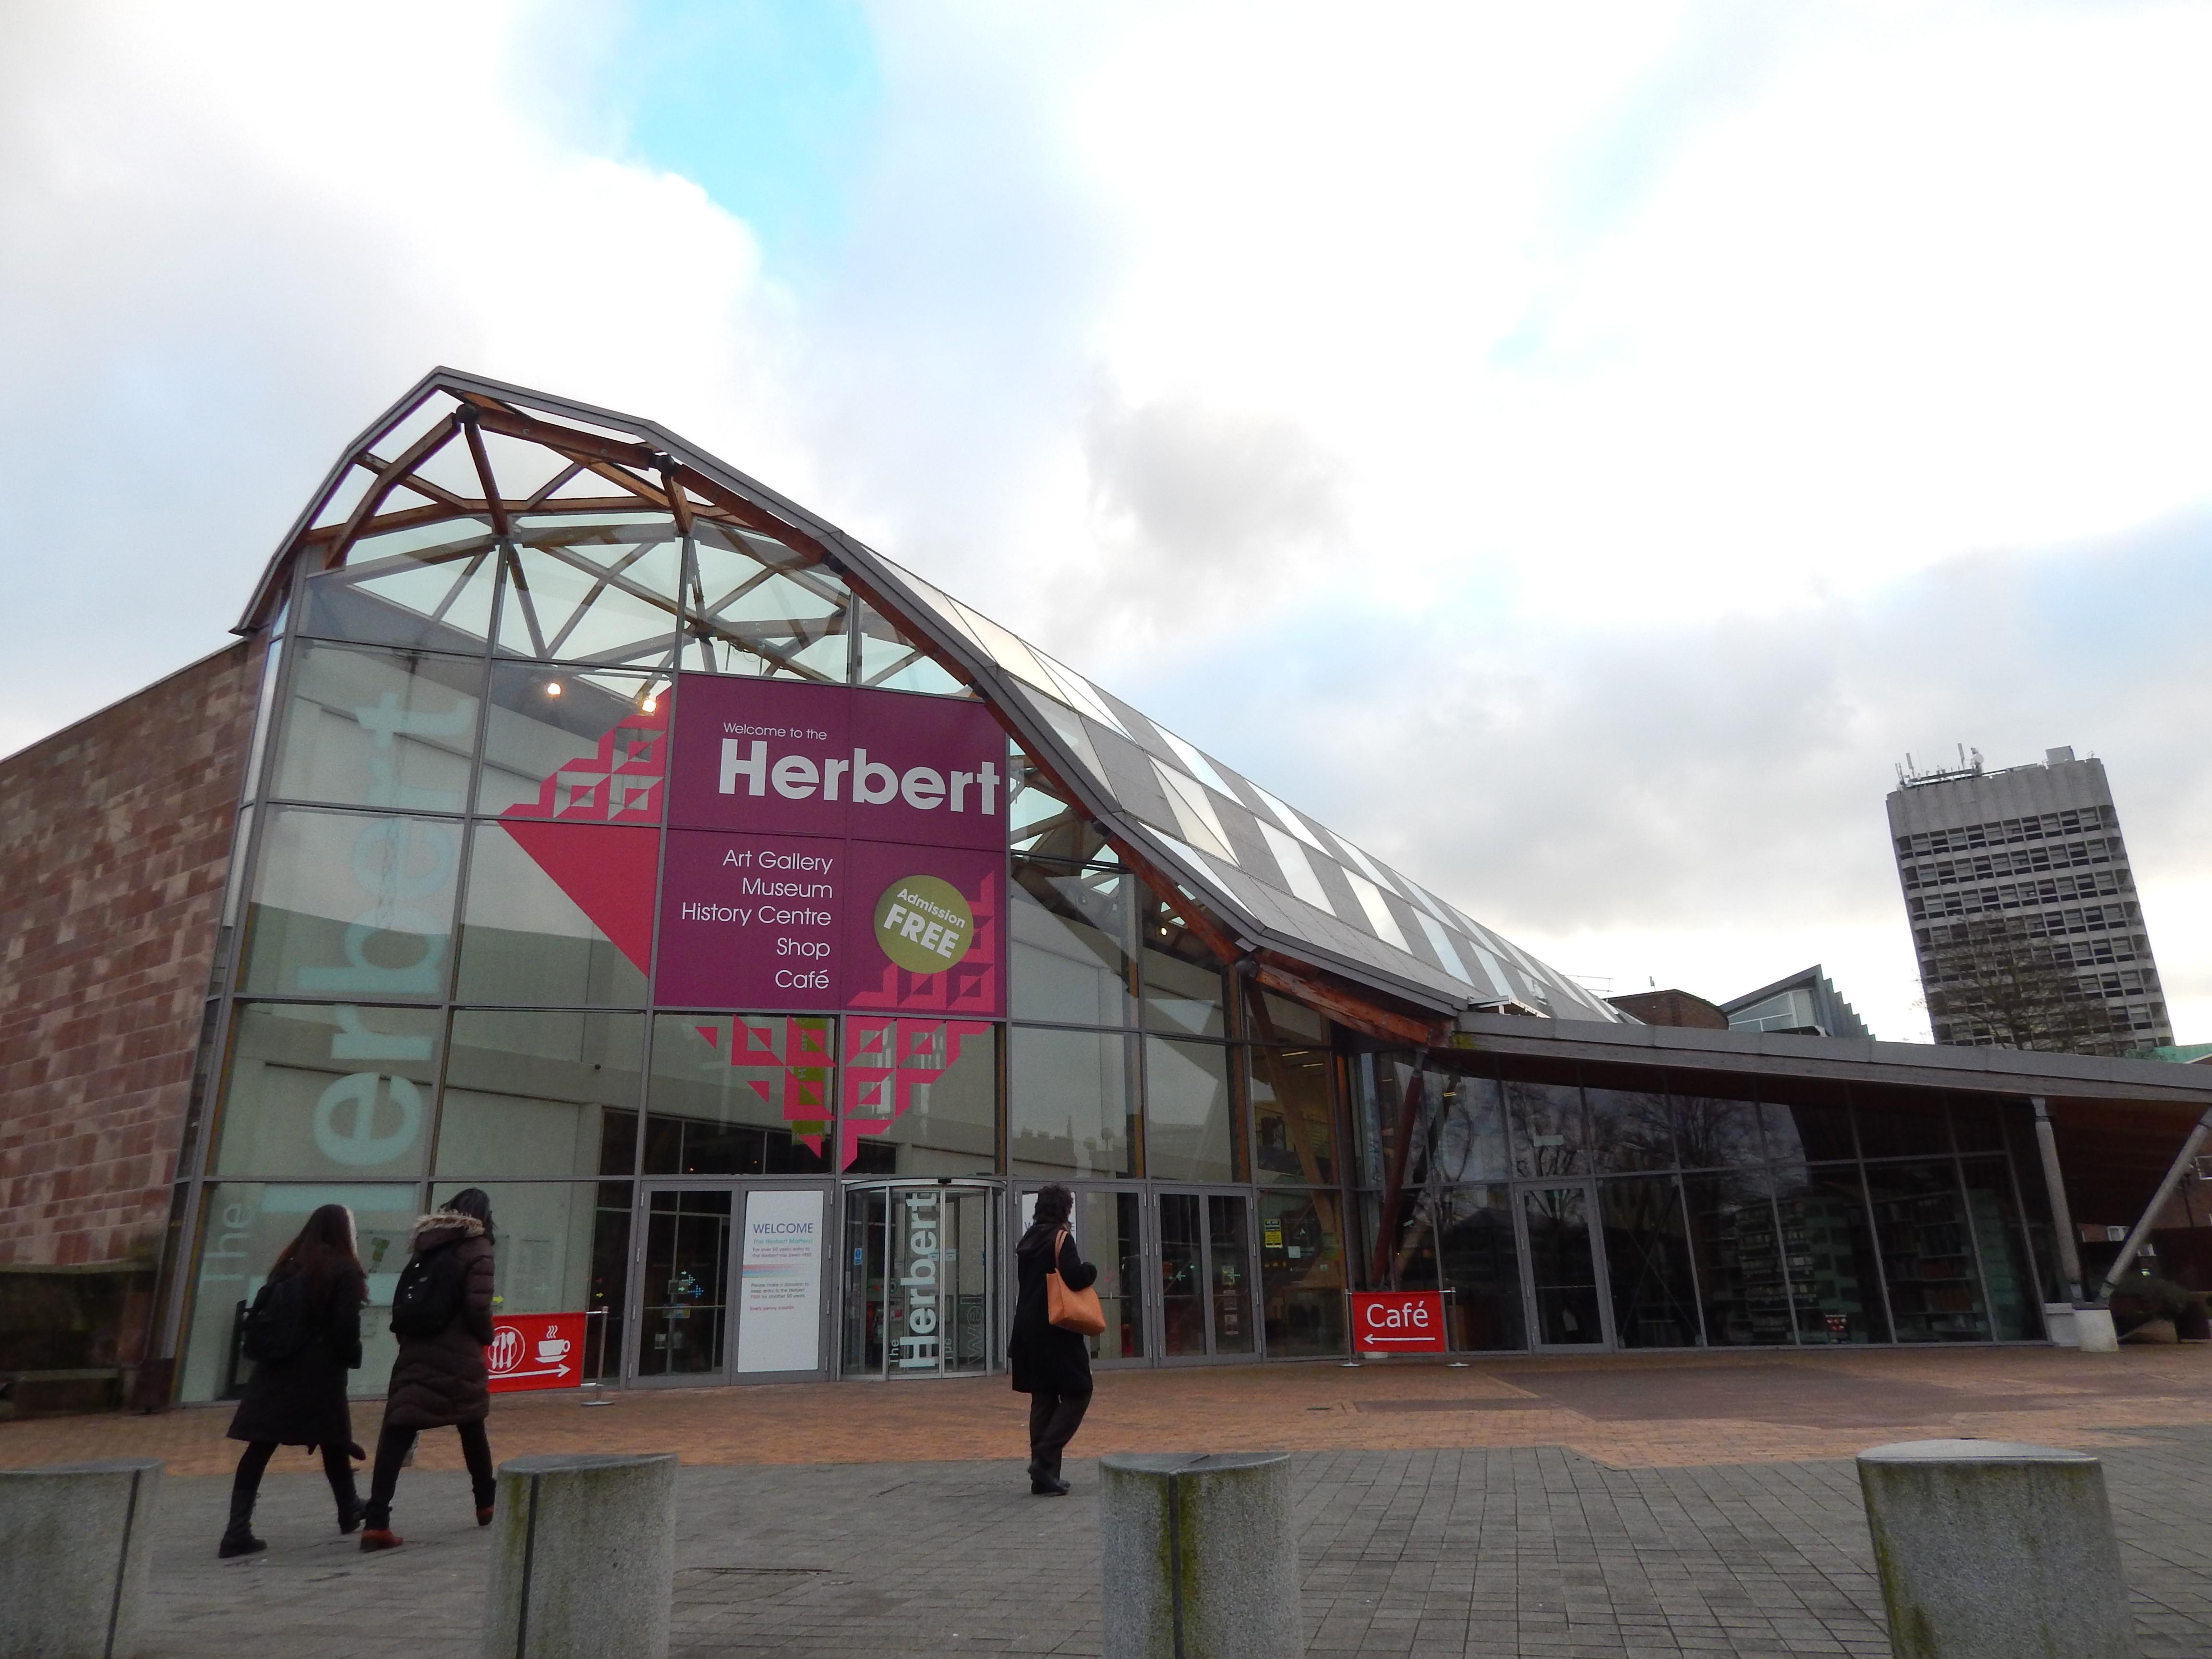 herbert art gallery and musem coventry